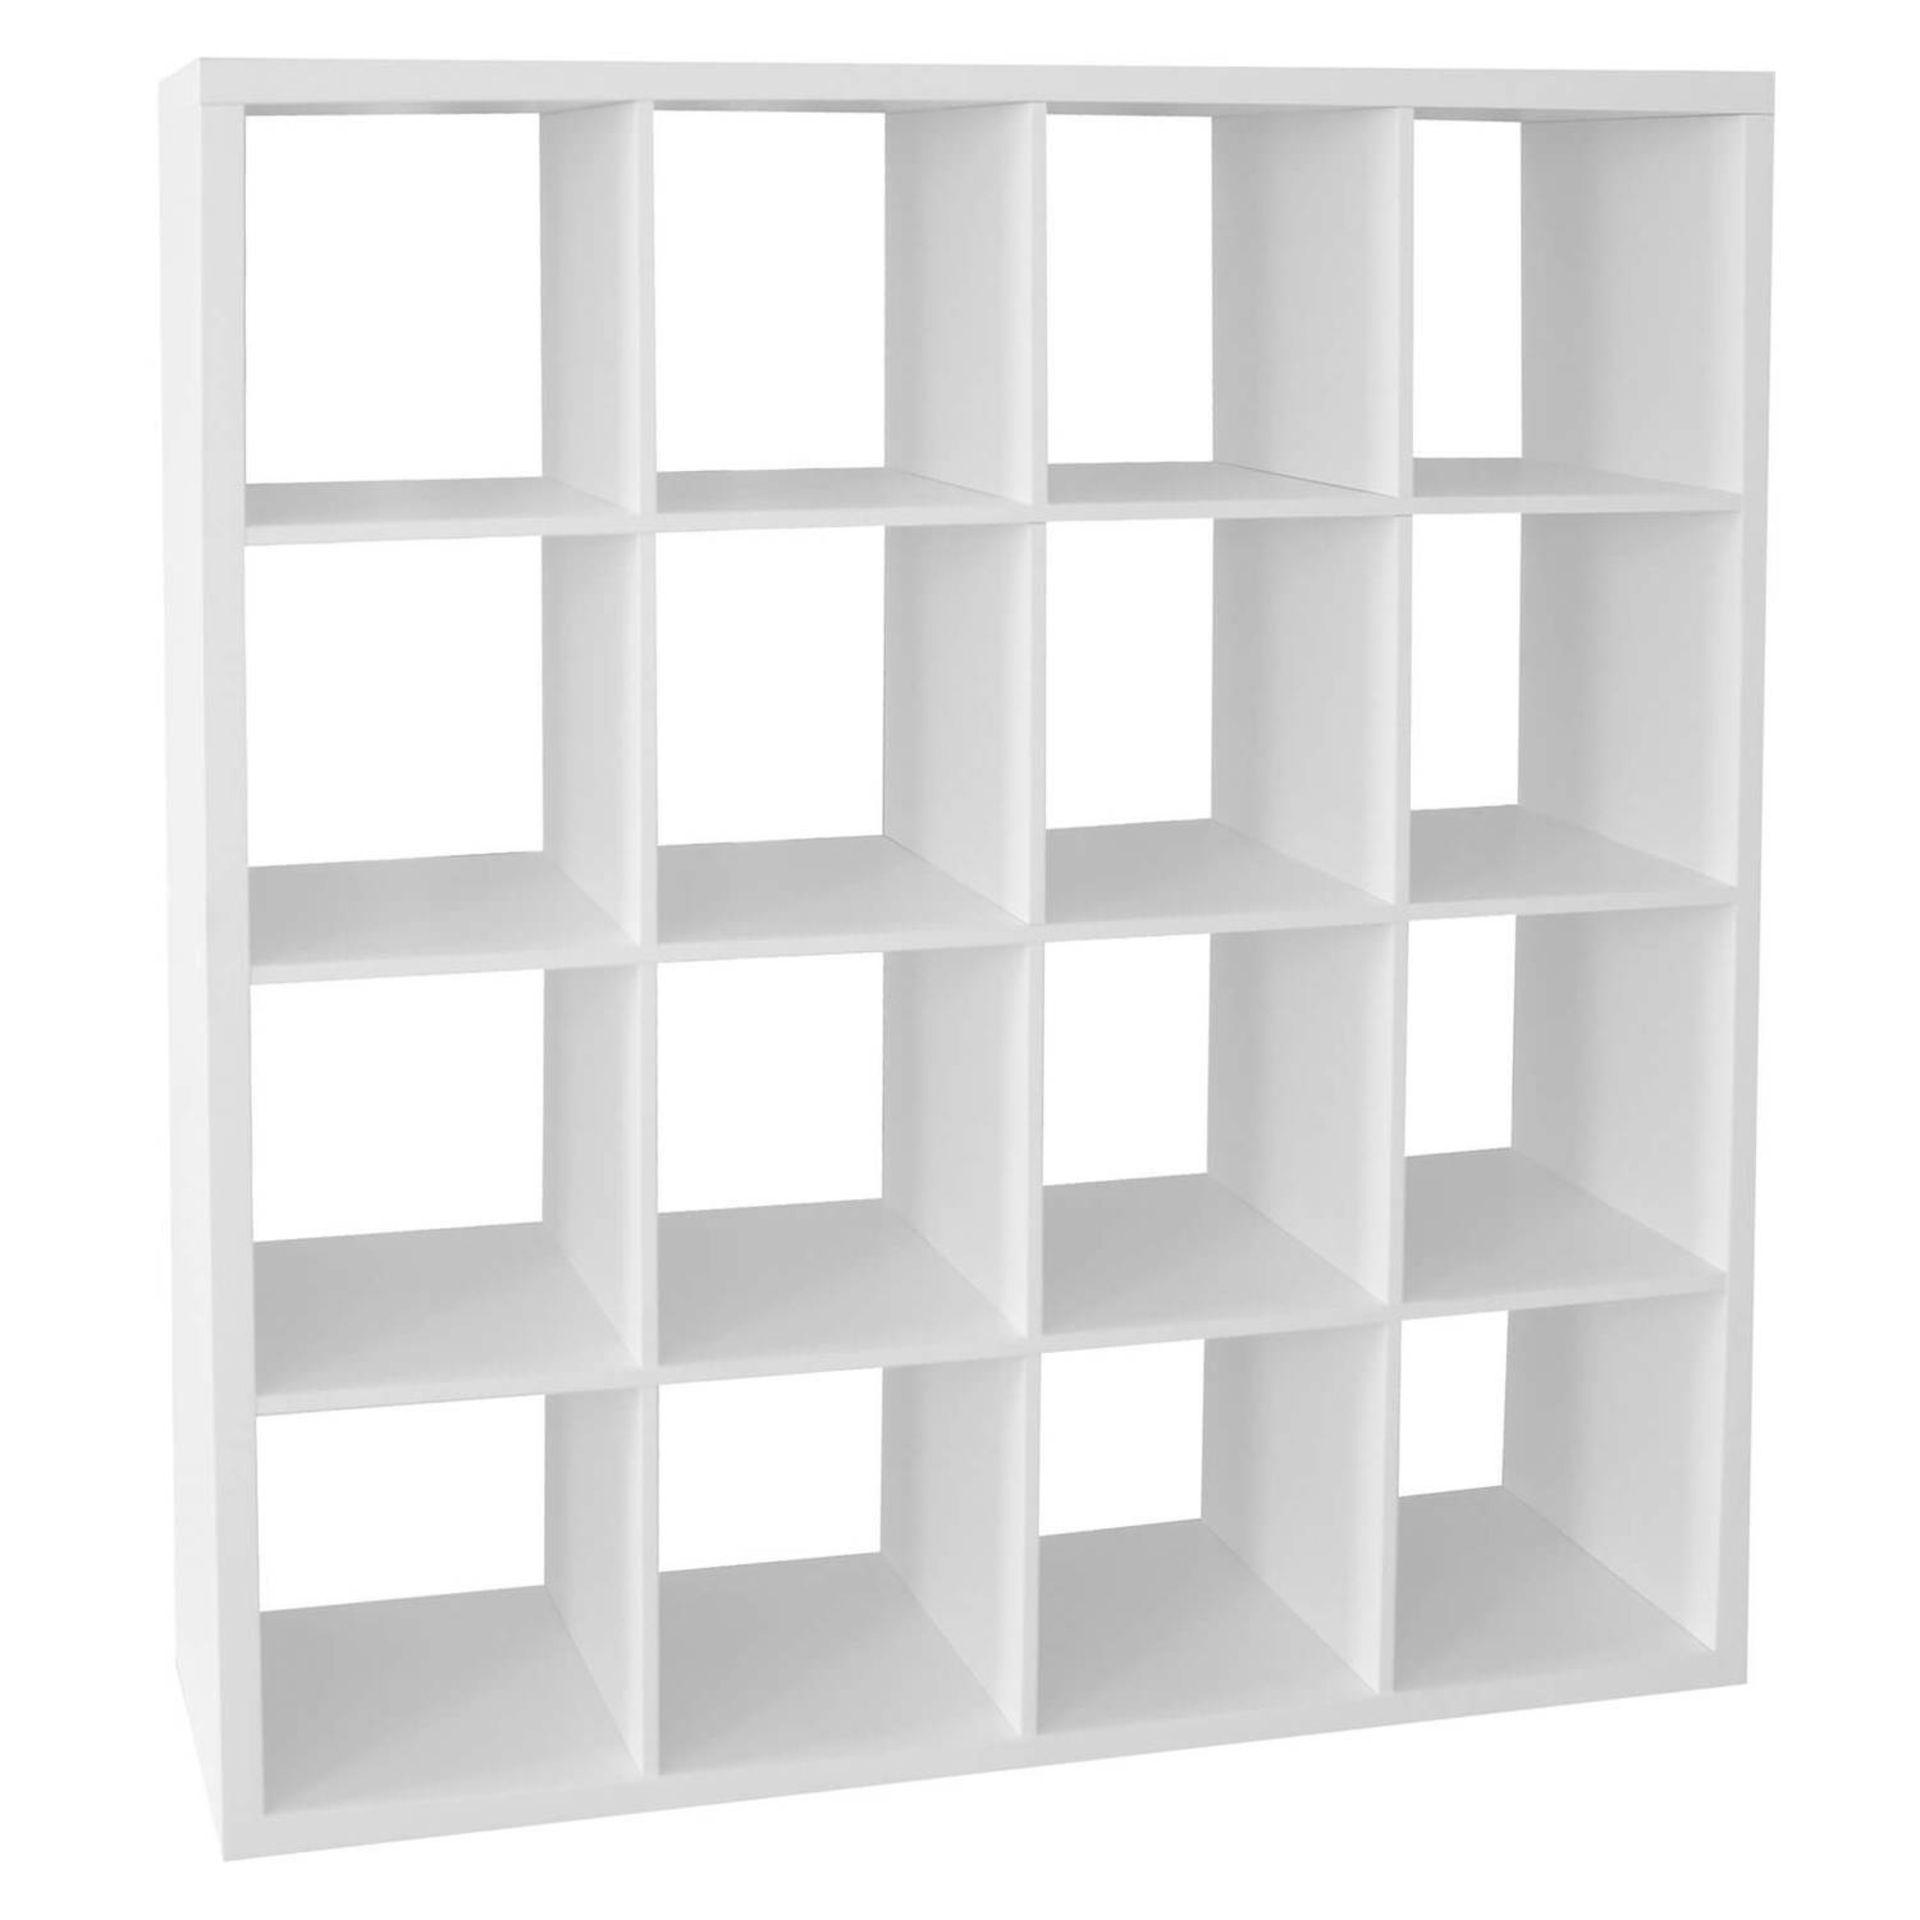 (2K) 4x Items. 1x Hamilton Shoe Cabinet Charcoal. 1x Hamilton Hallway Cabinet Navy (H76x W70x D32.5 - Image 3 of 8